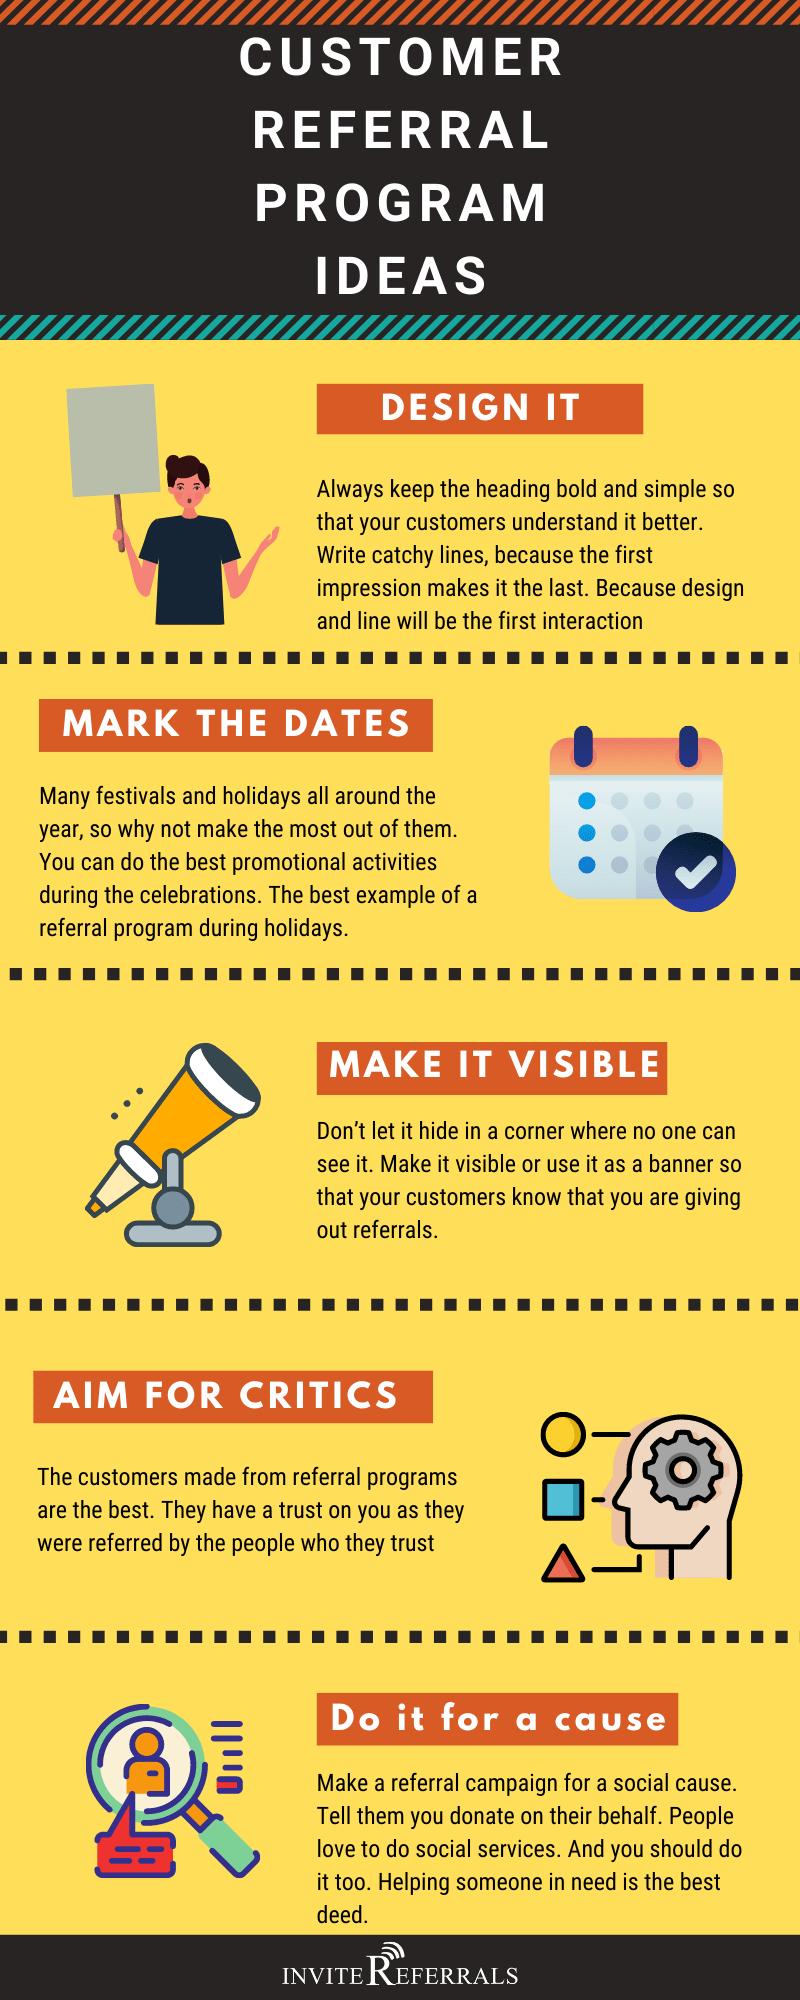 referral program ideas infographic